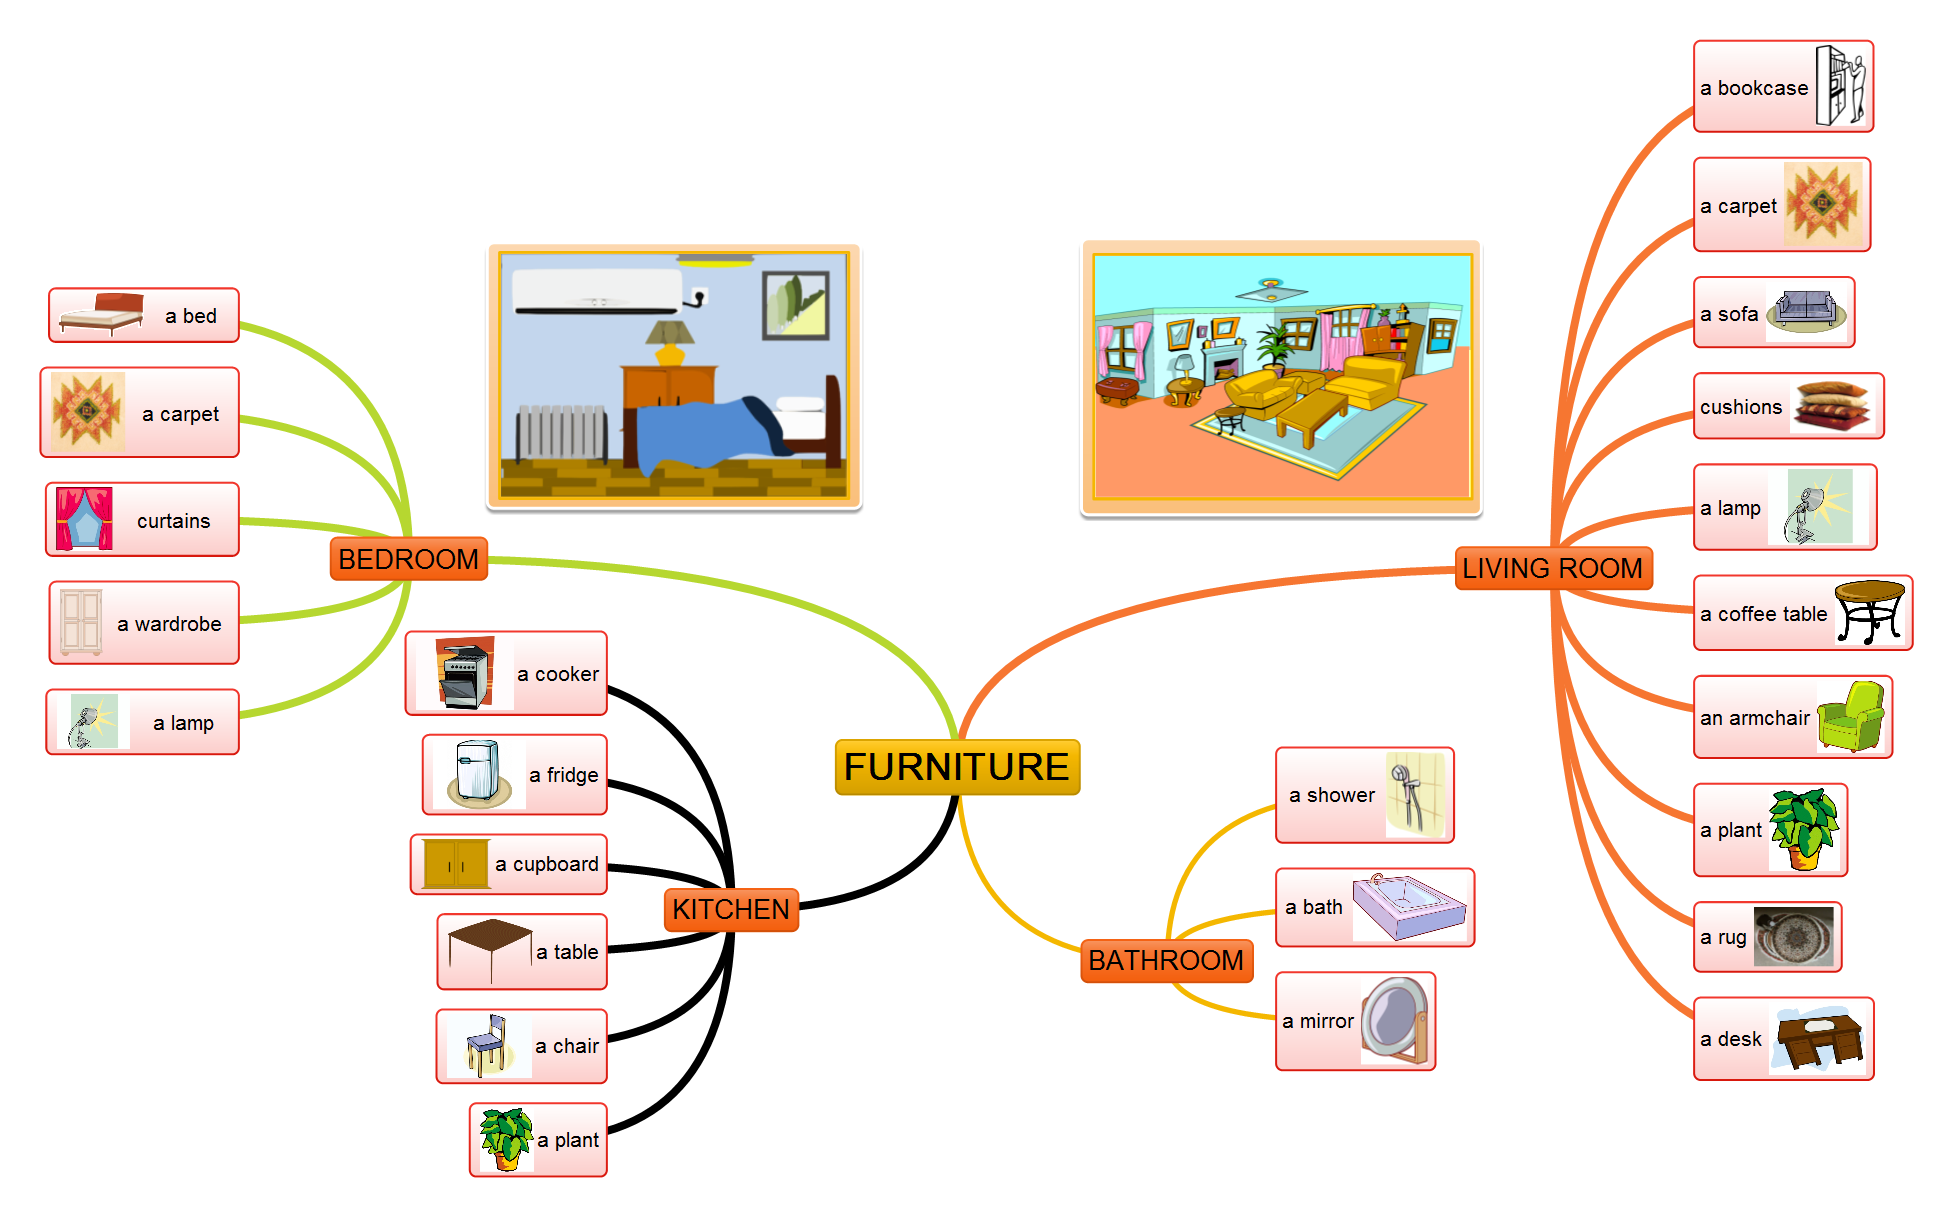 furniture vocabulary mind map